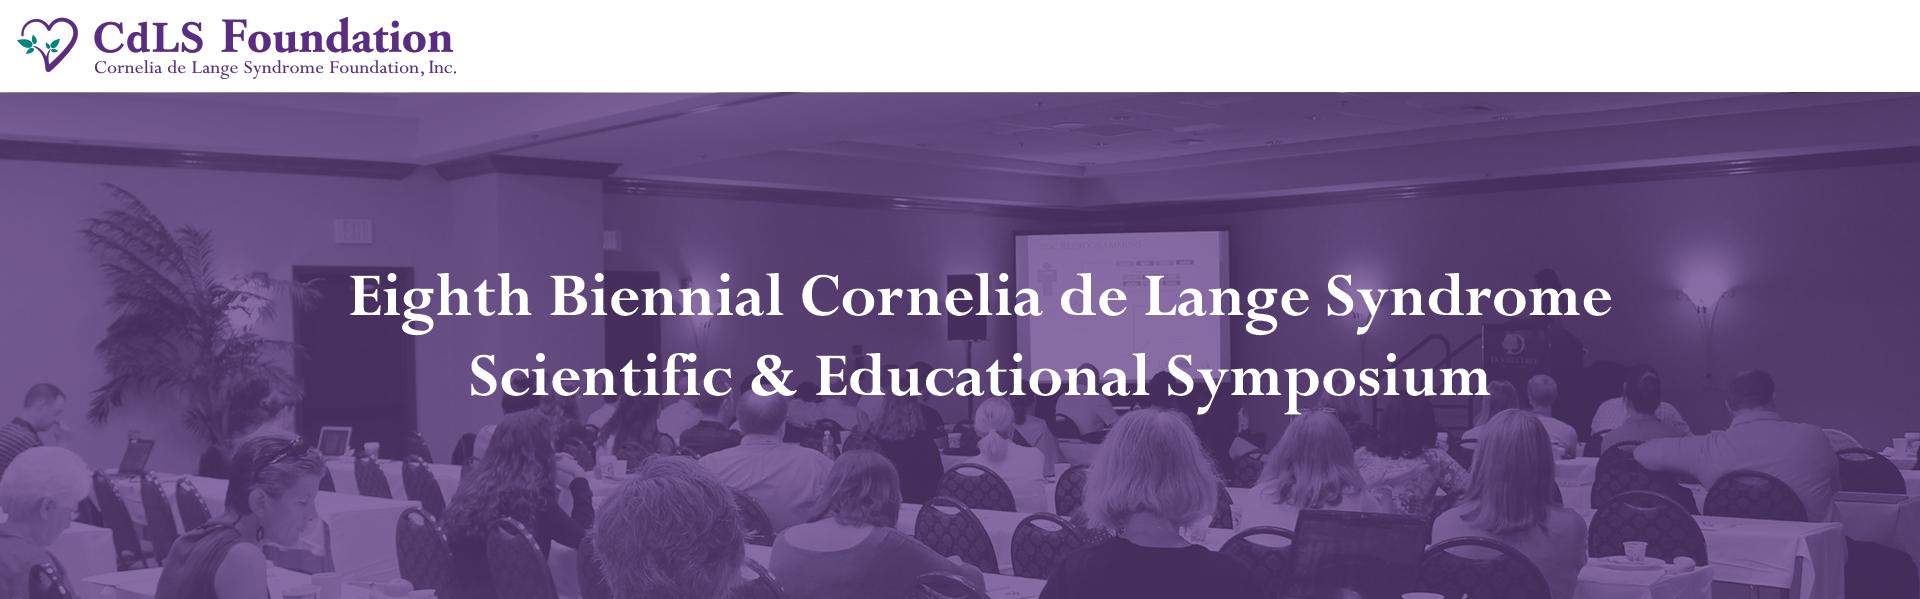 Eighth Biennial Cornelia de Lange Syndrome Scientific & Educational Symposium